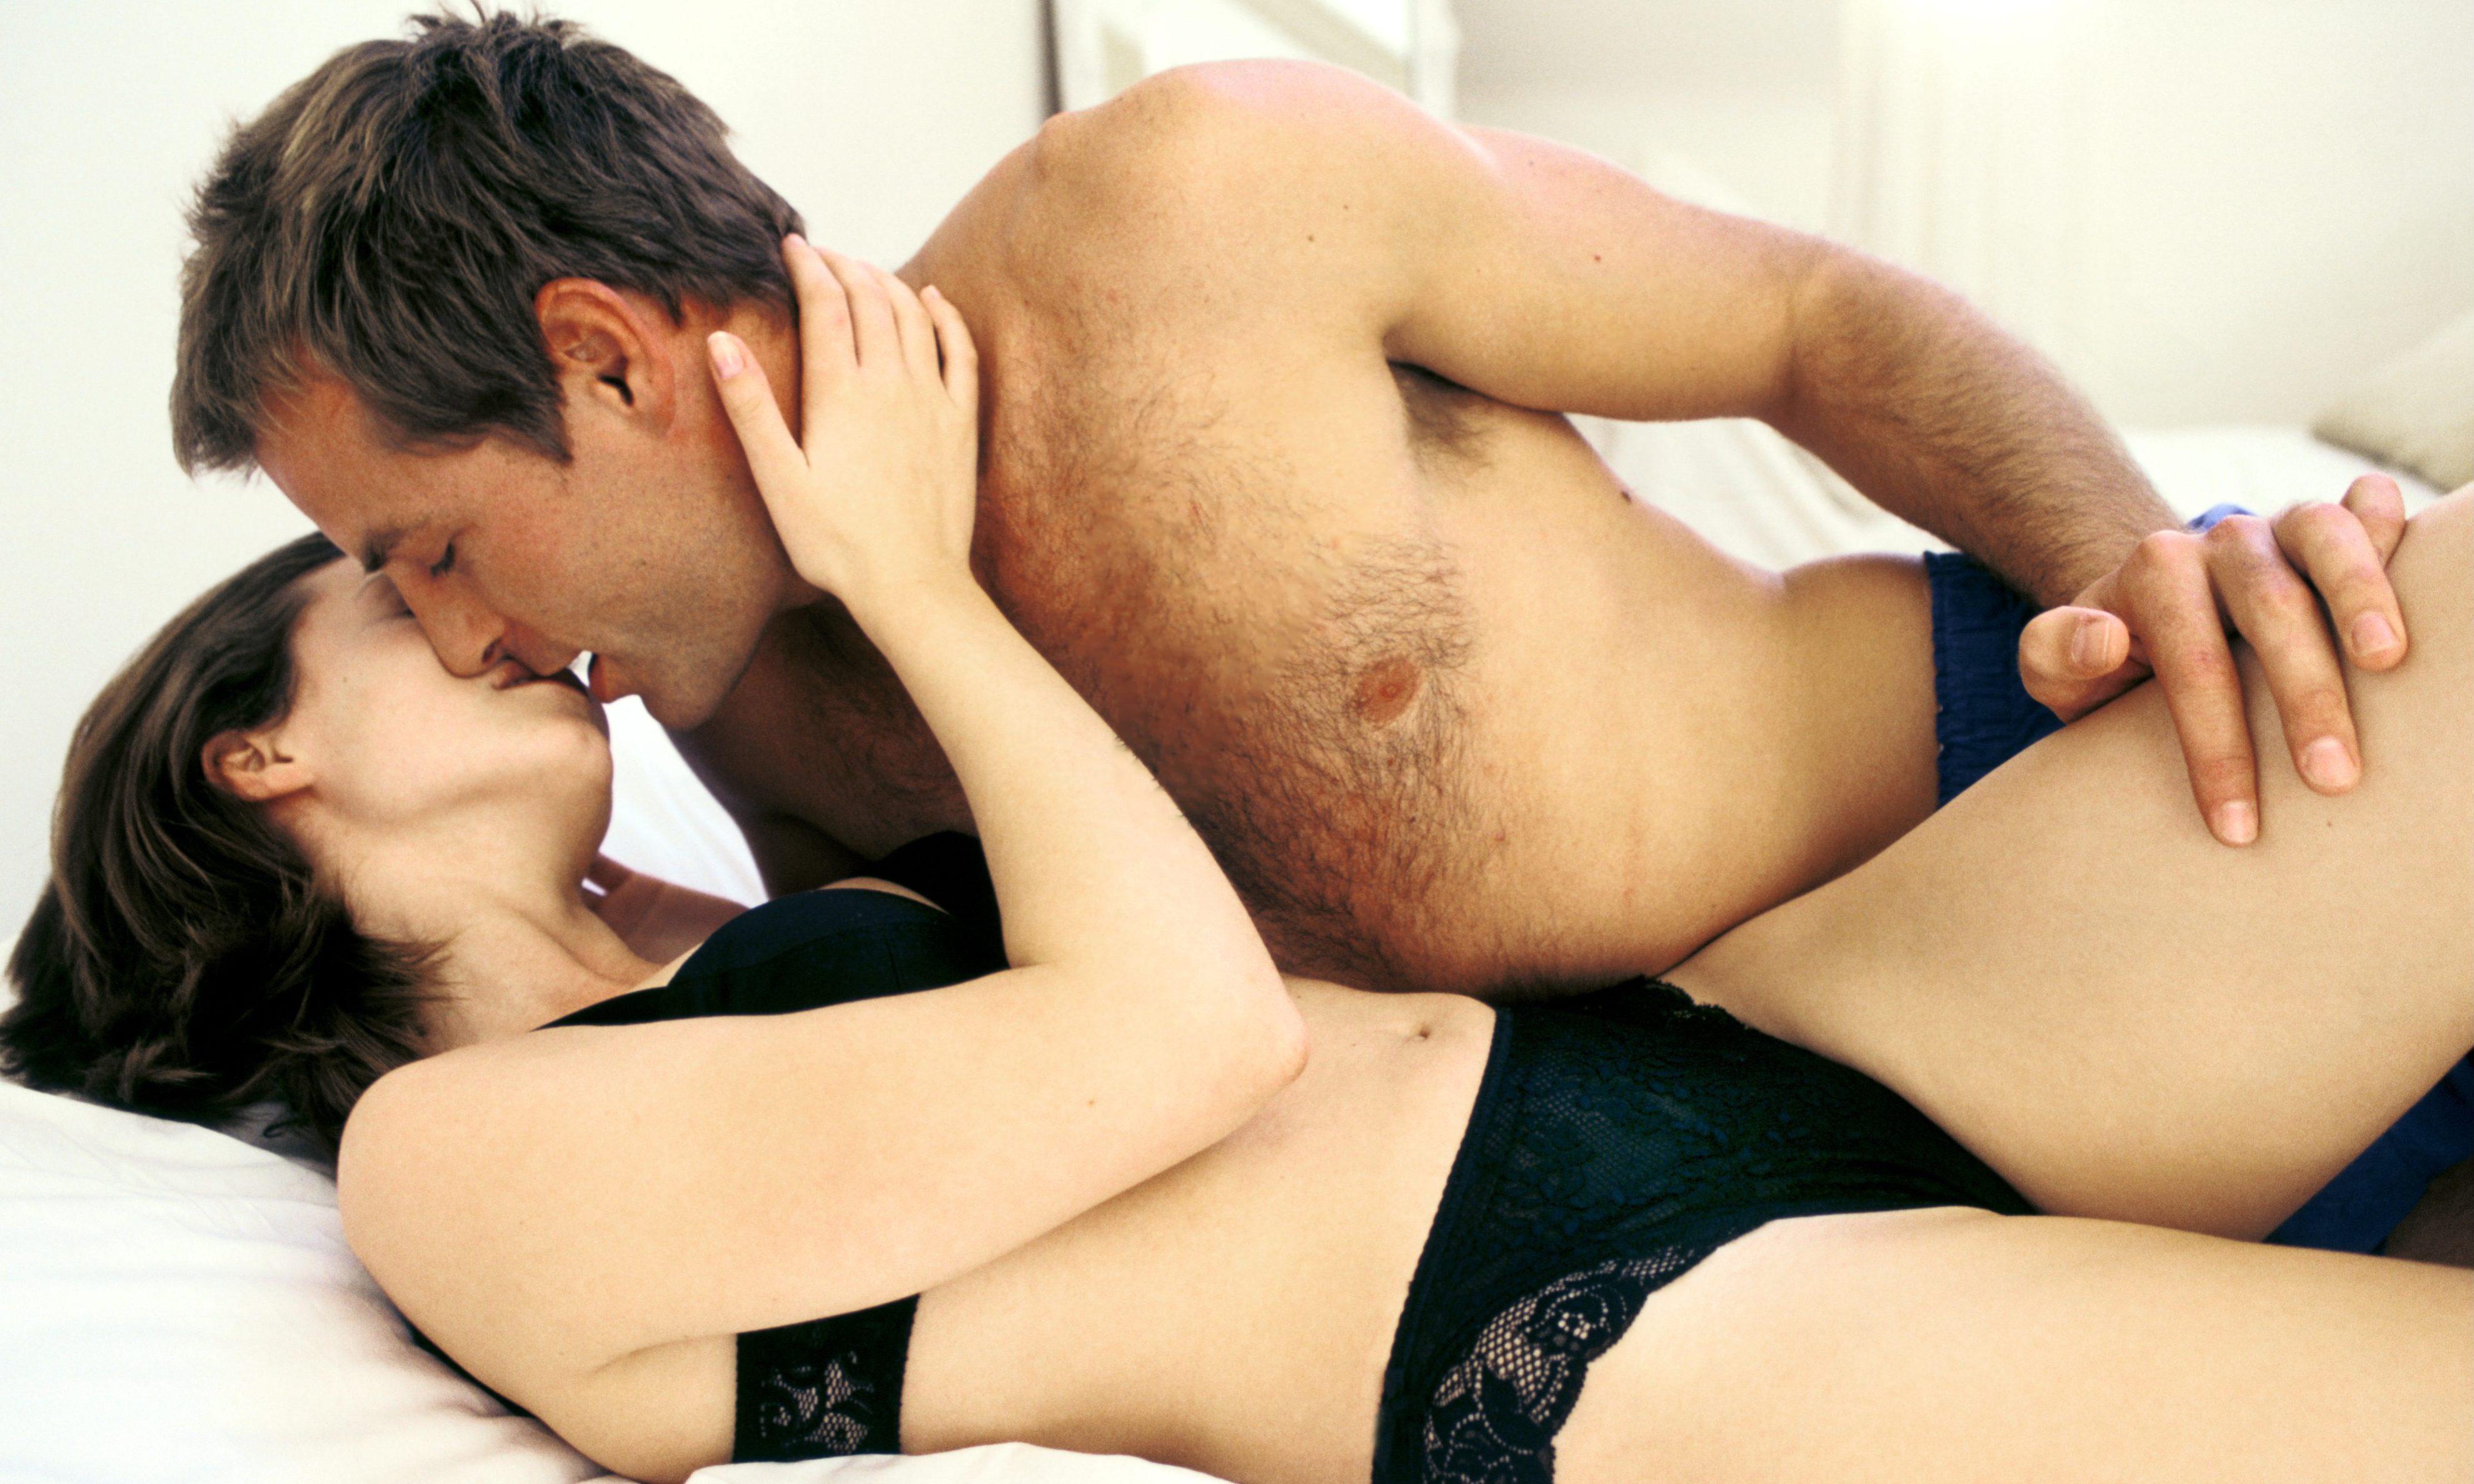 Erotic mom sex video forums